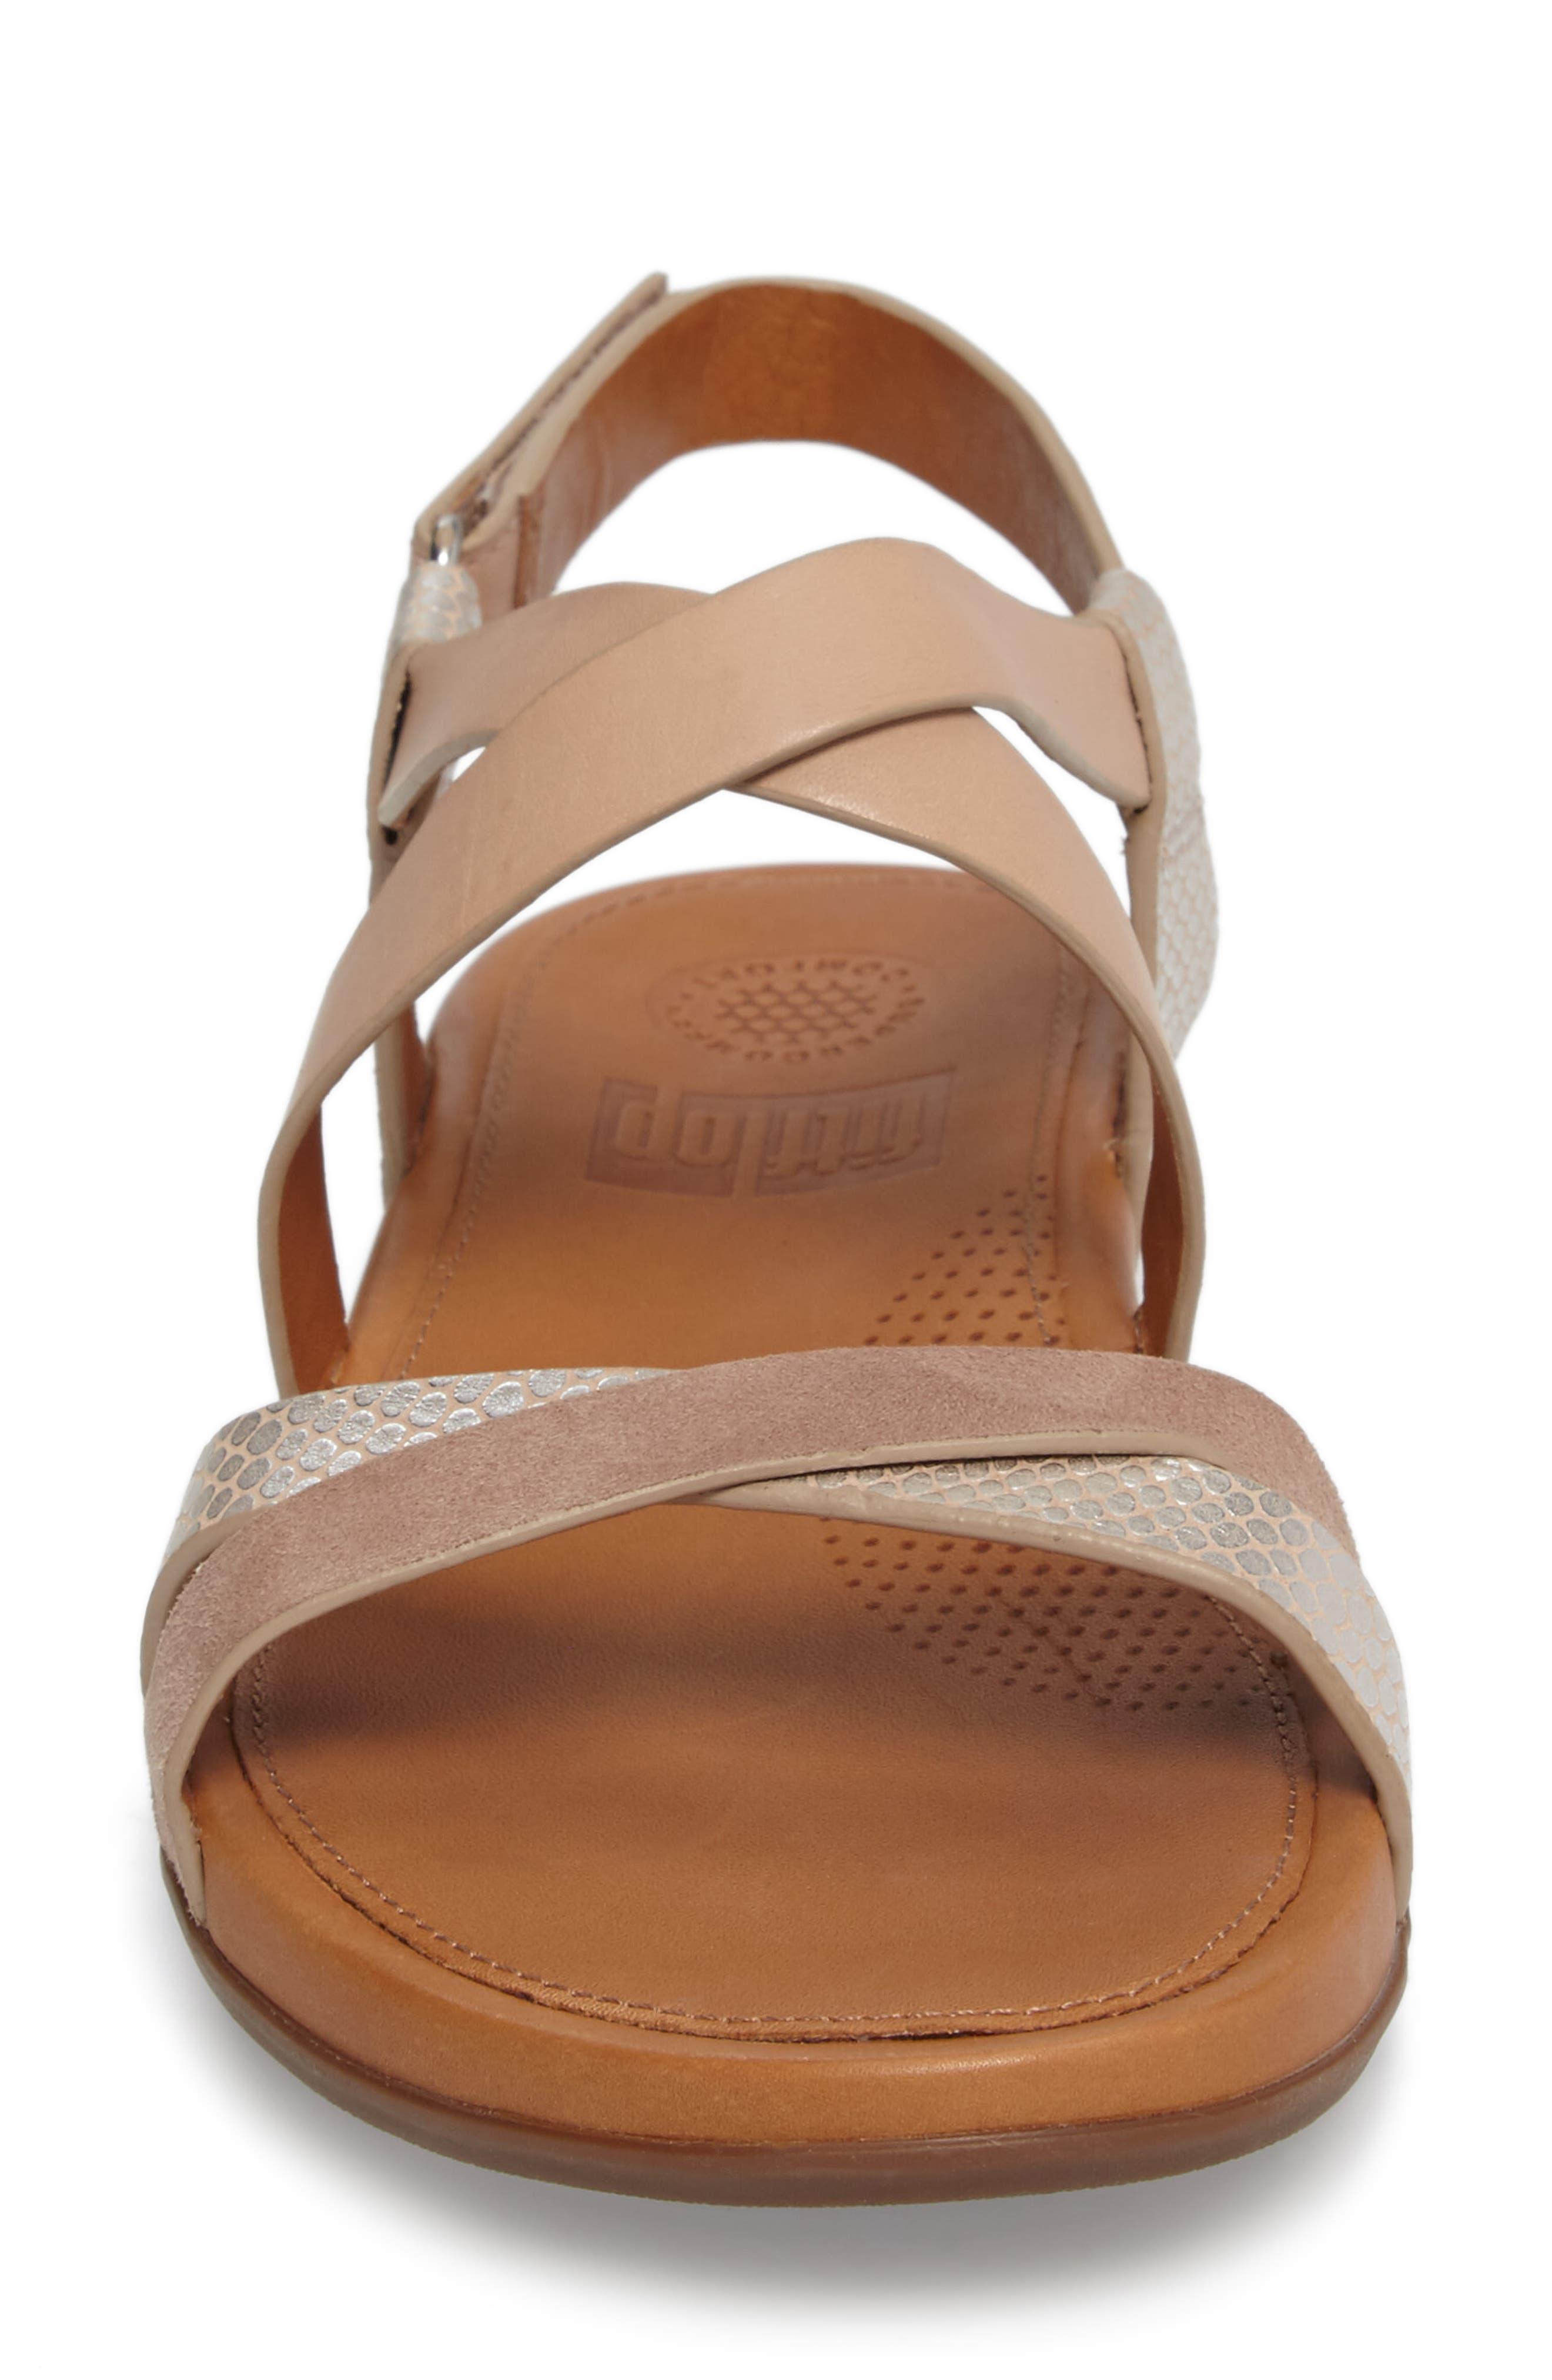 Lumy Crisscross Sandal,                             Alternate thumbnail 4, color,                             Peachy/ Silver Snake Suede